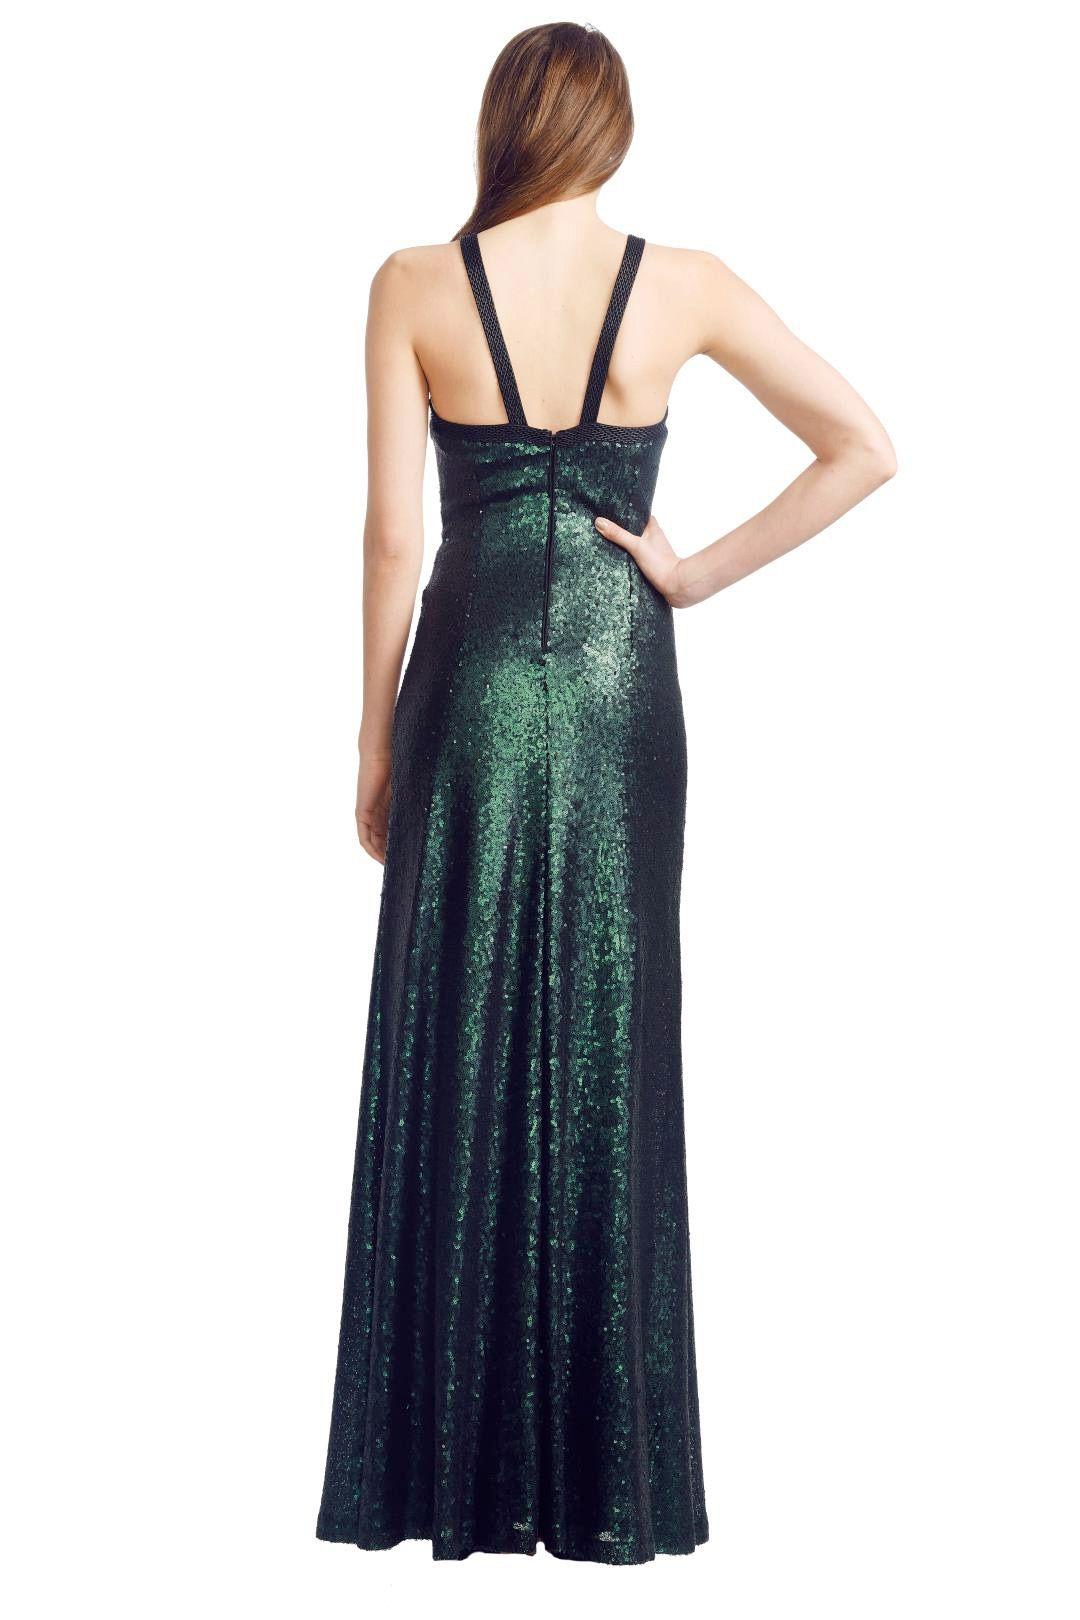 George - Emerald Luna Gown - Green - Back